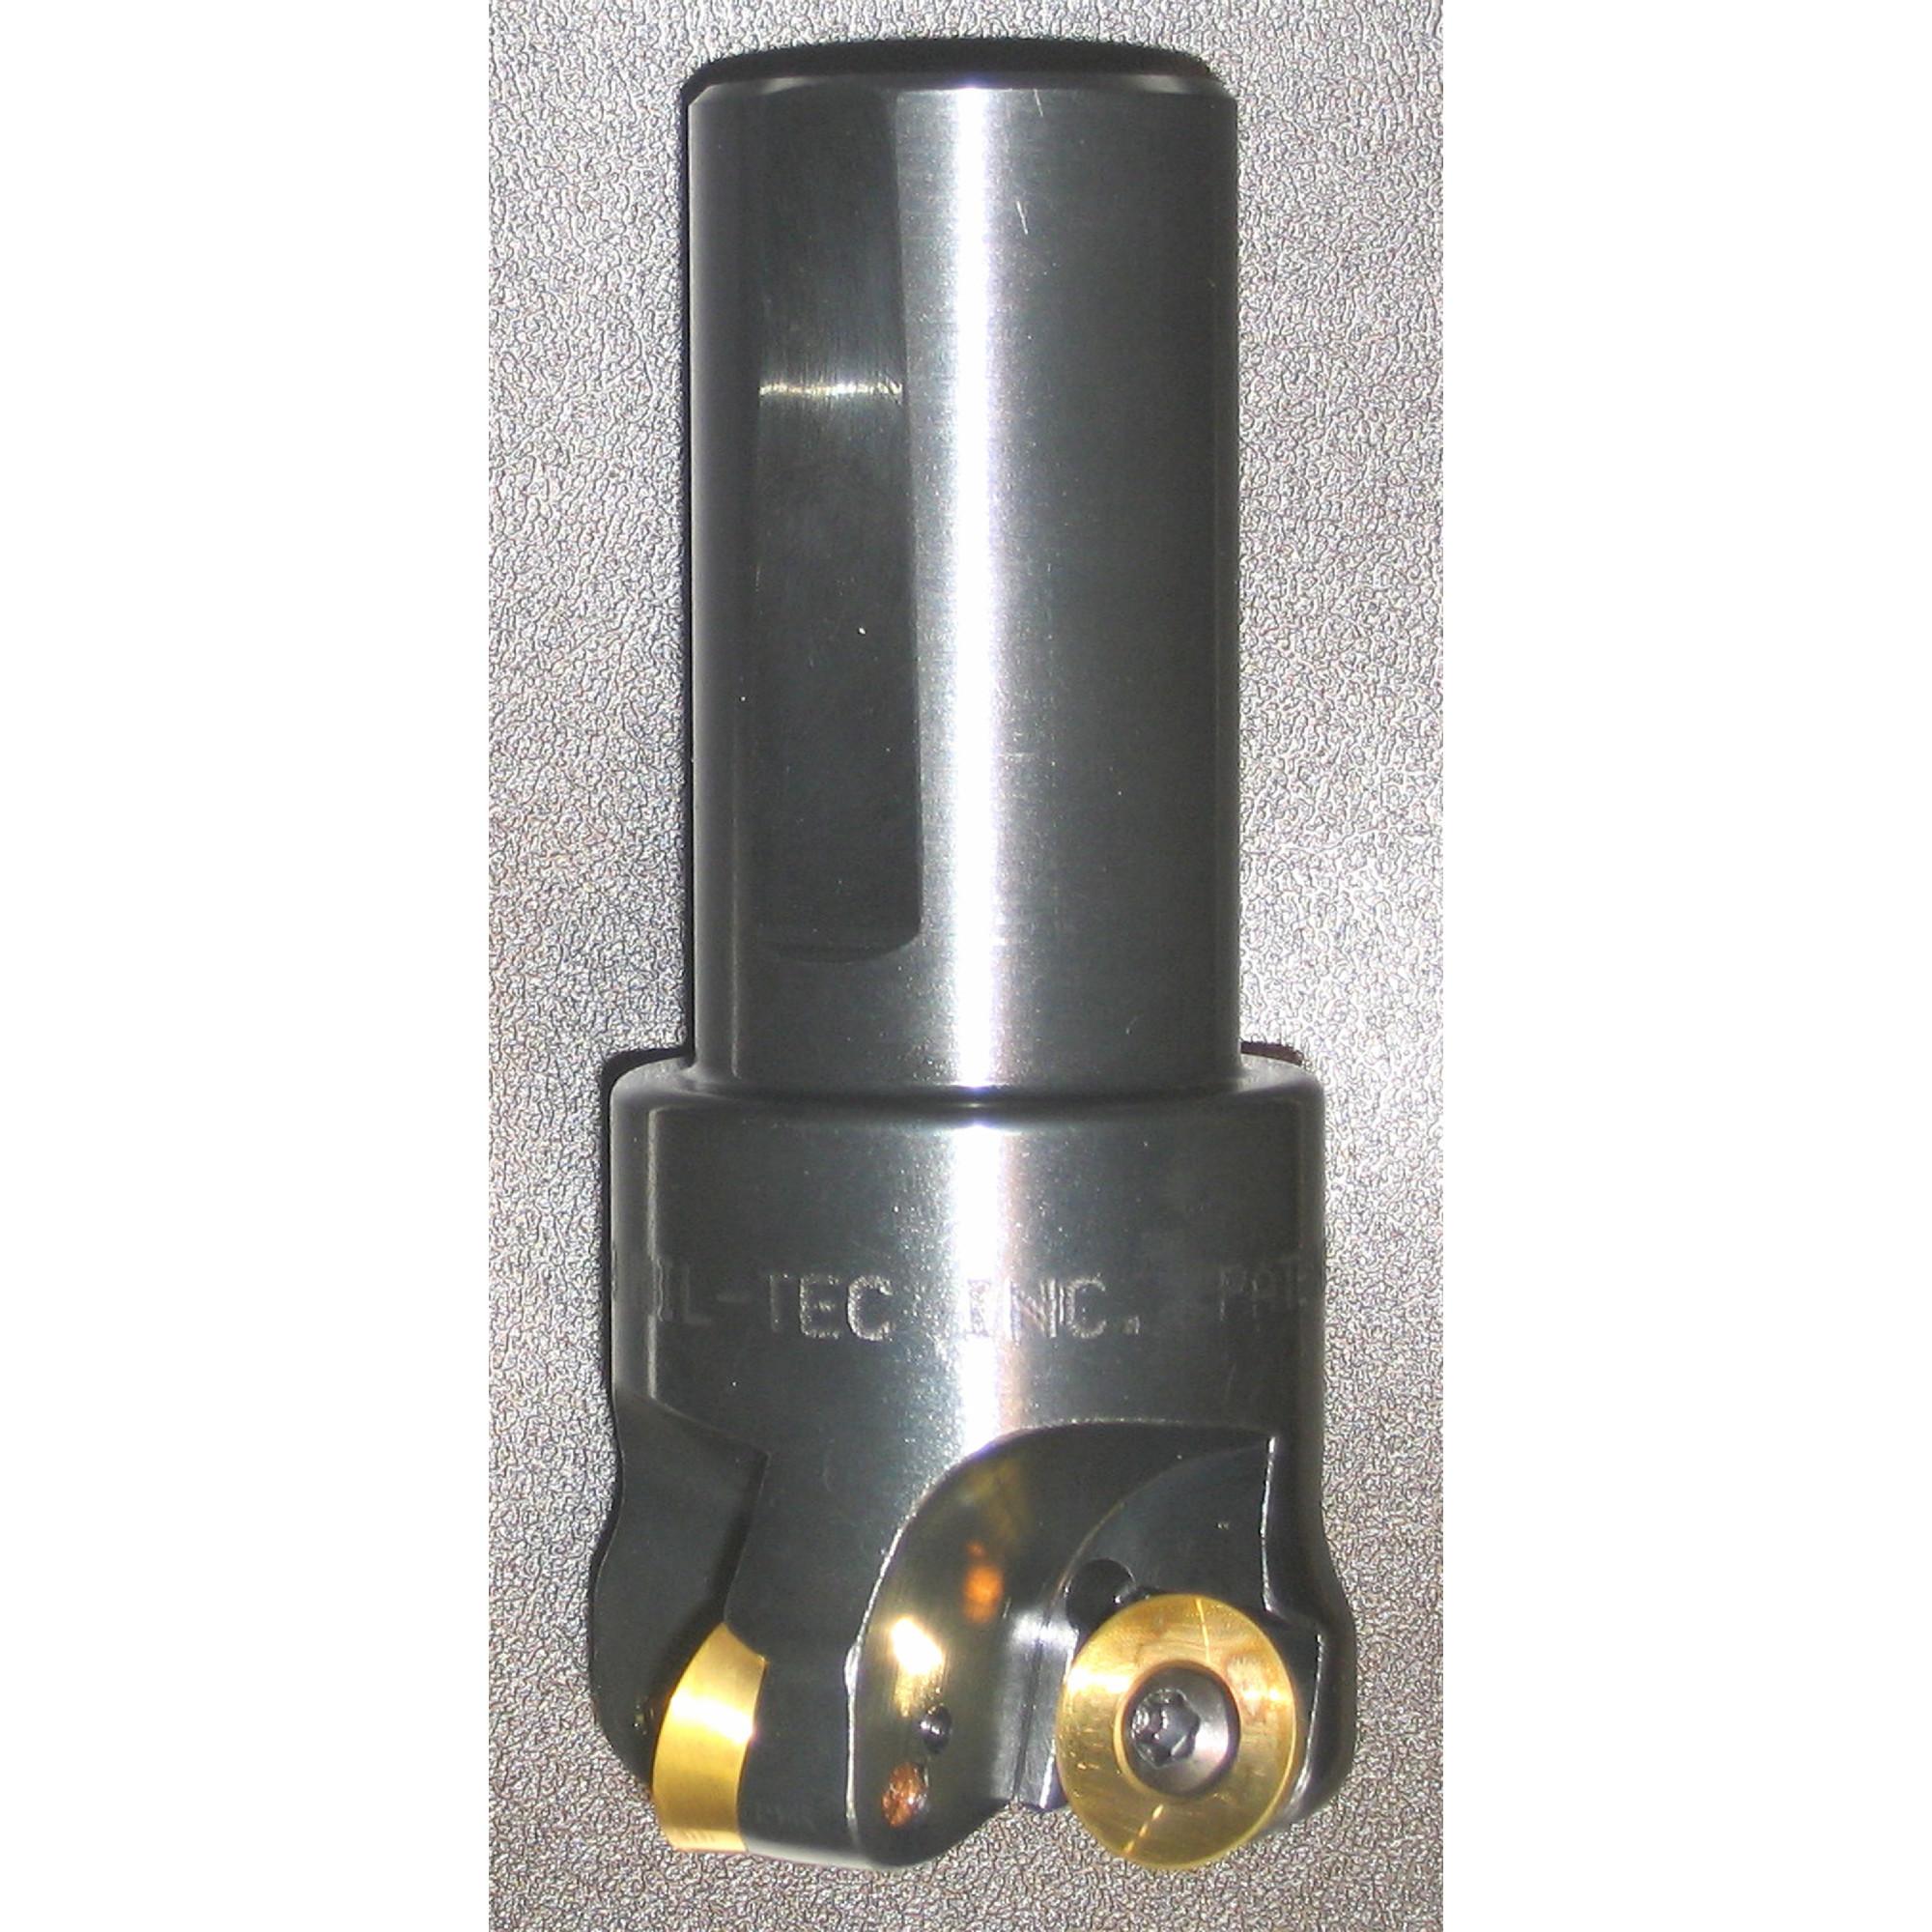 "MIL-TEC - FC8-1.5 - Endmill / 1.500"" Cutting Diameter / 3 Tooth / R8 Shank / Freedom Cutter Extended Reach Series / Righ"